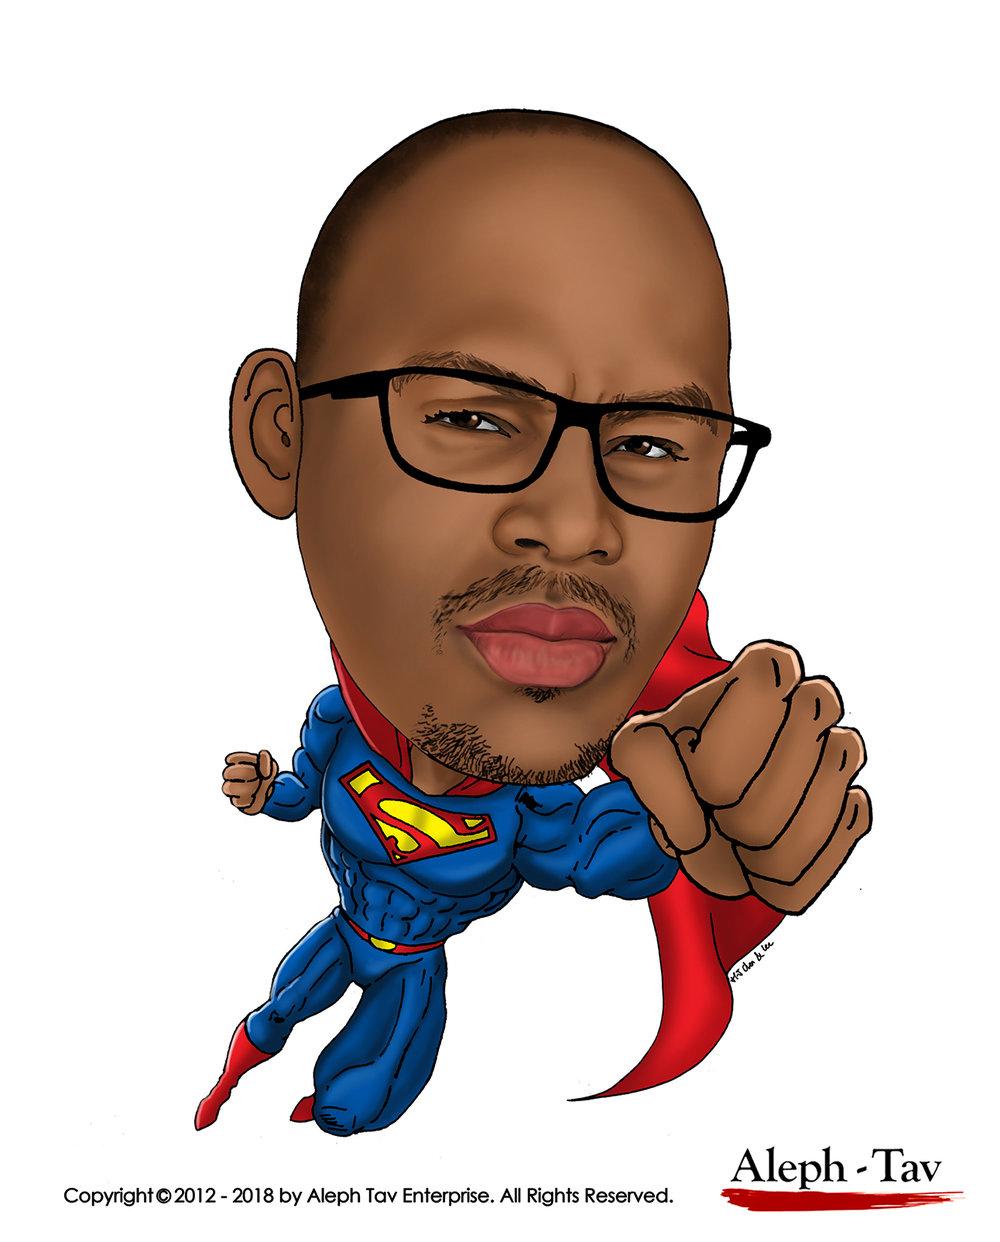 superhero-theme-birthday-caricature-personalized-gifts (3).jpg